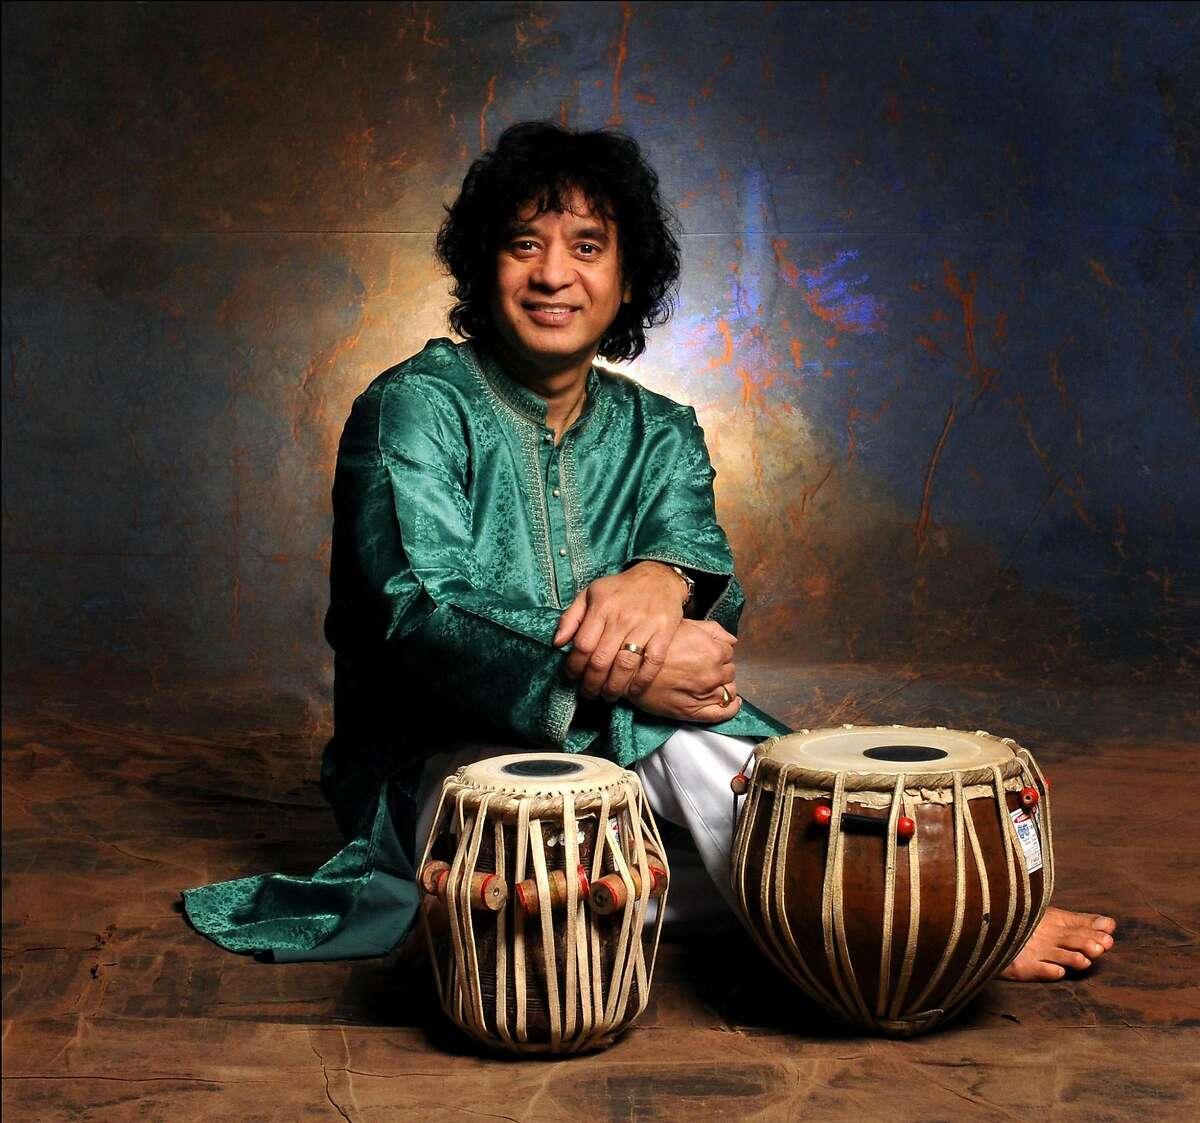 The SFJazz Gala scheduled for Jan. 18 will honor tabla maestro Zakir Hussain.